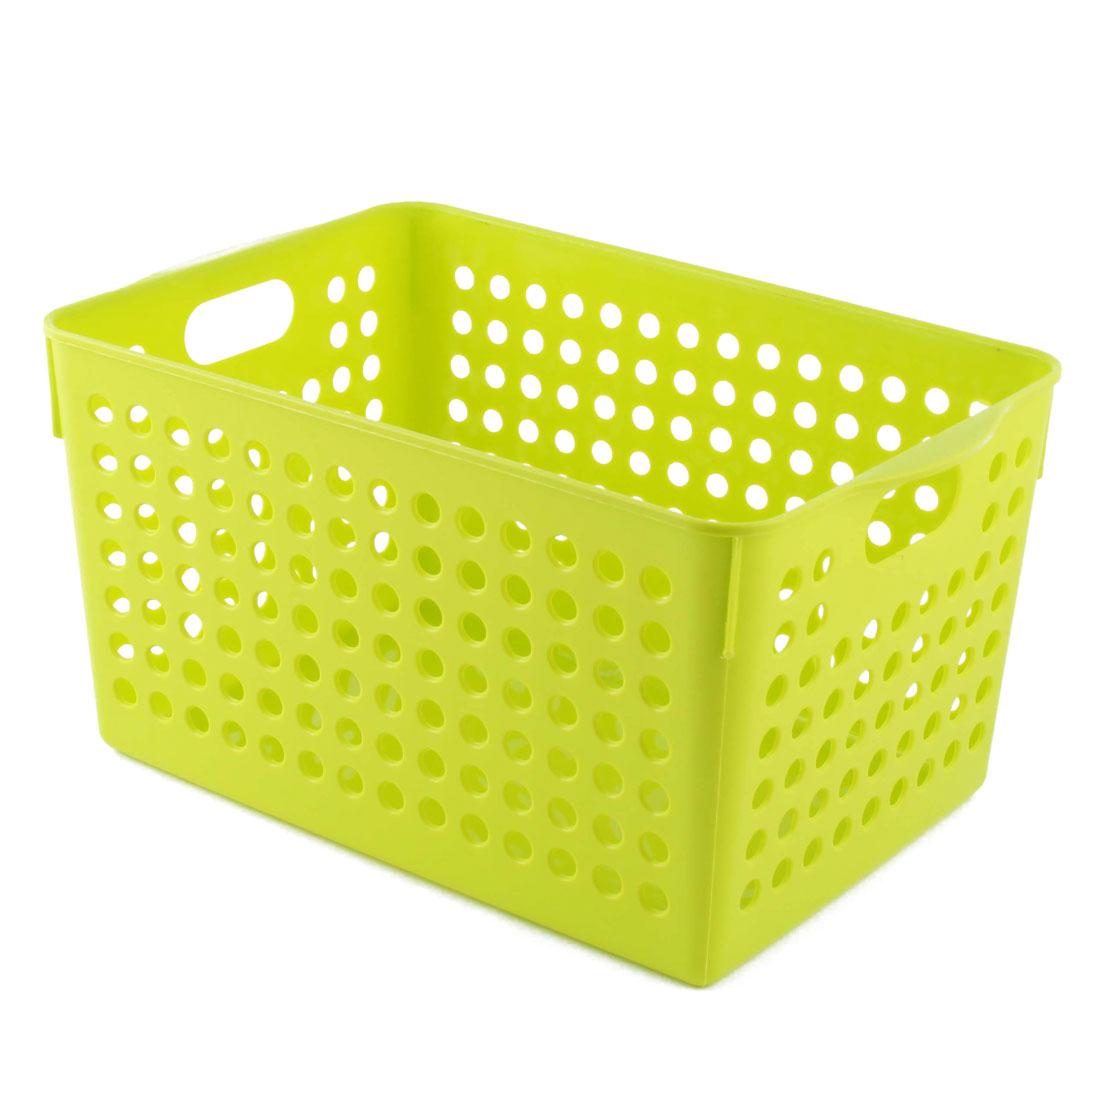 Bathroom Plastic Rectangular Shape Hollow Out Design Storage Organizer Basket